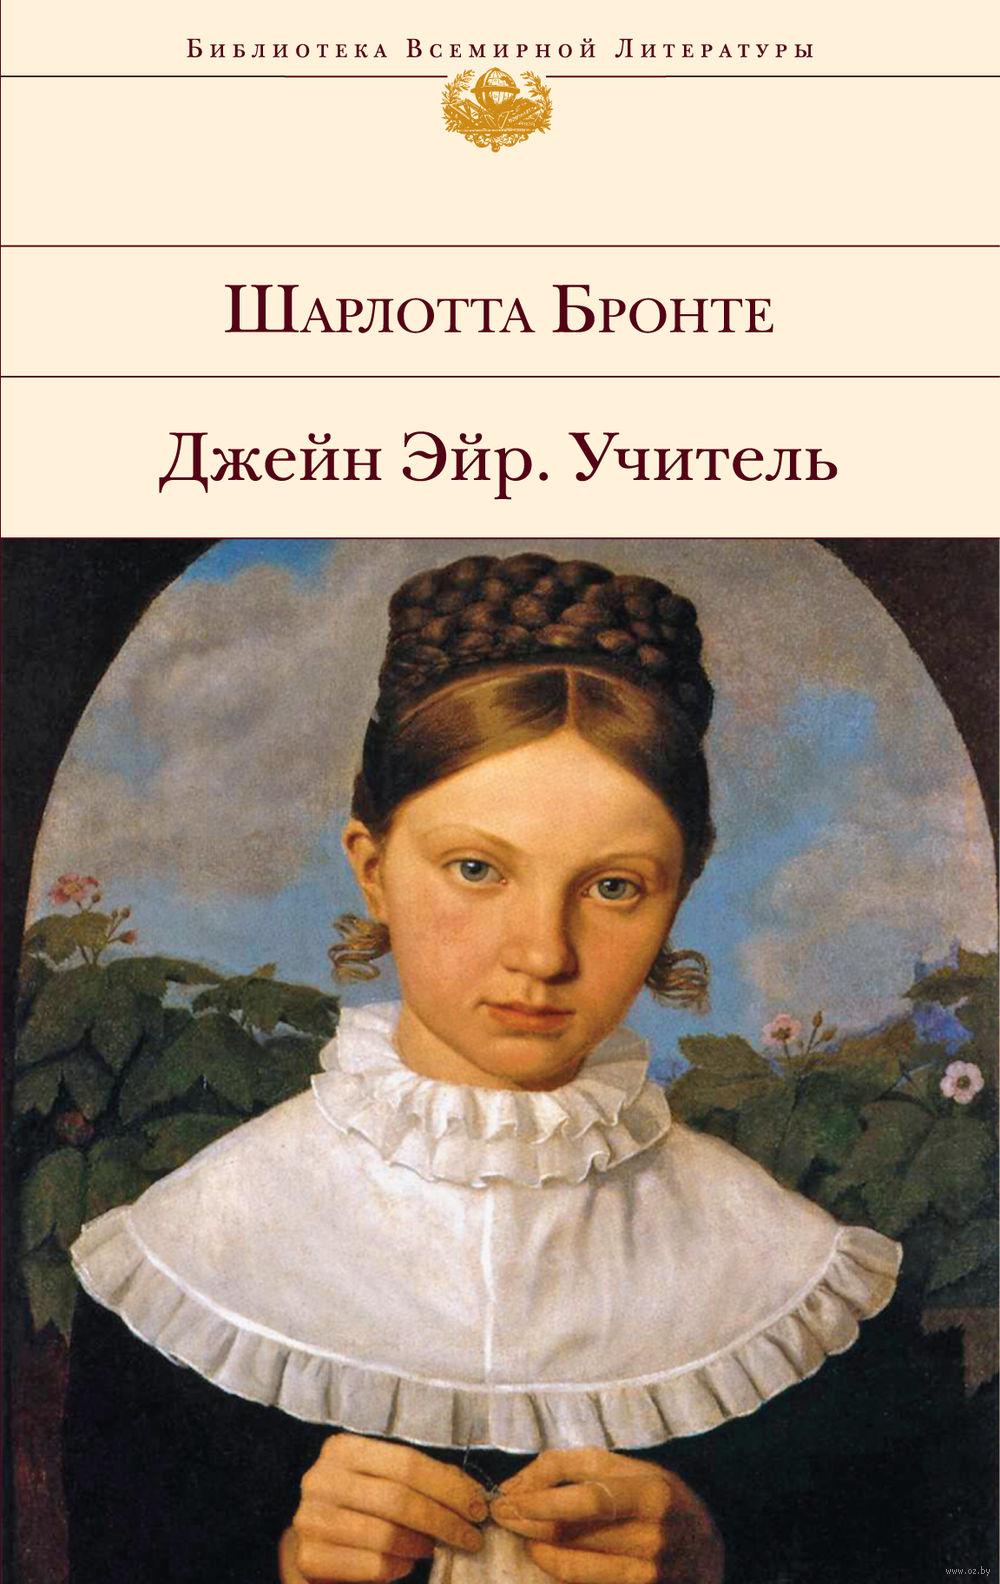 jane eyre charlotte bronte Jane eyre is the fictional heroine of charlotte brontë's 1847 novel of the same name.